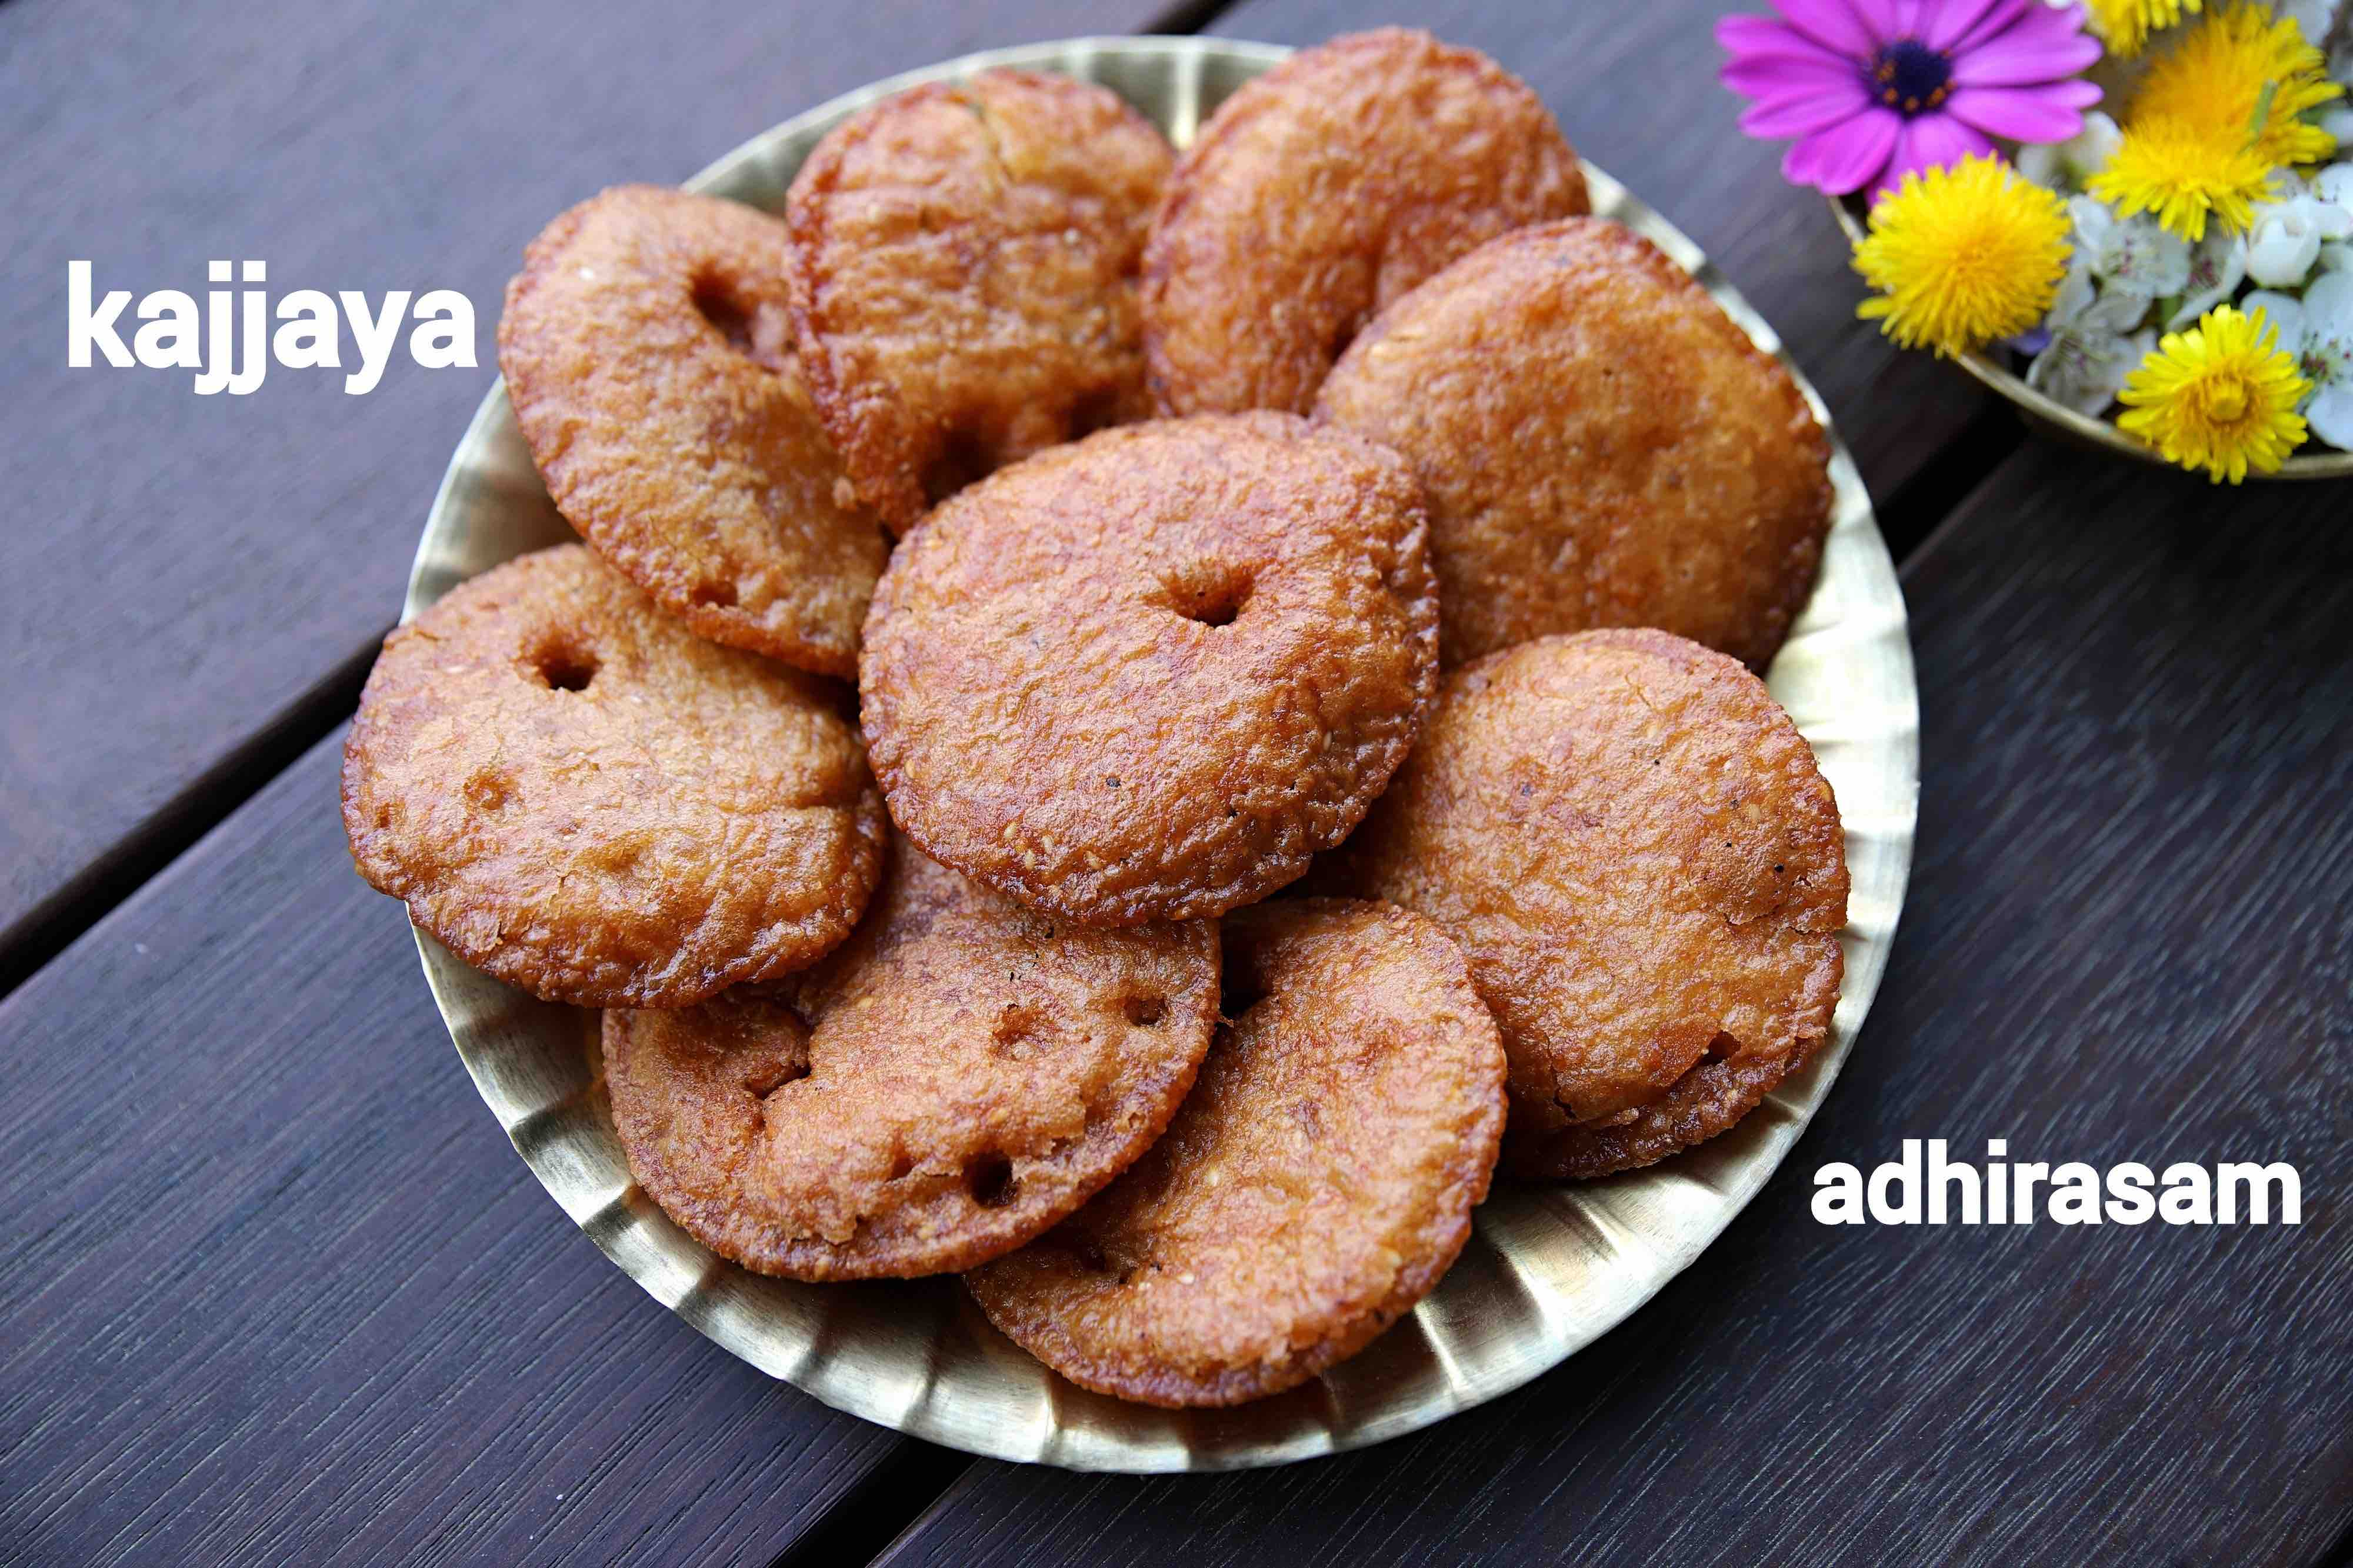 kajjaya recipe | adhirasam recipe | ariselu recipe | athirasa recipe